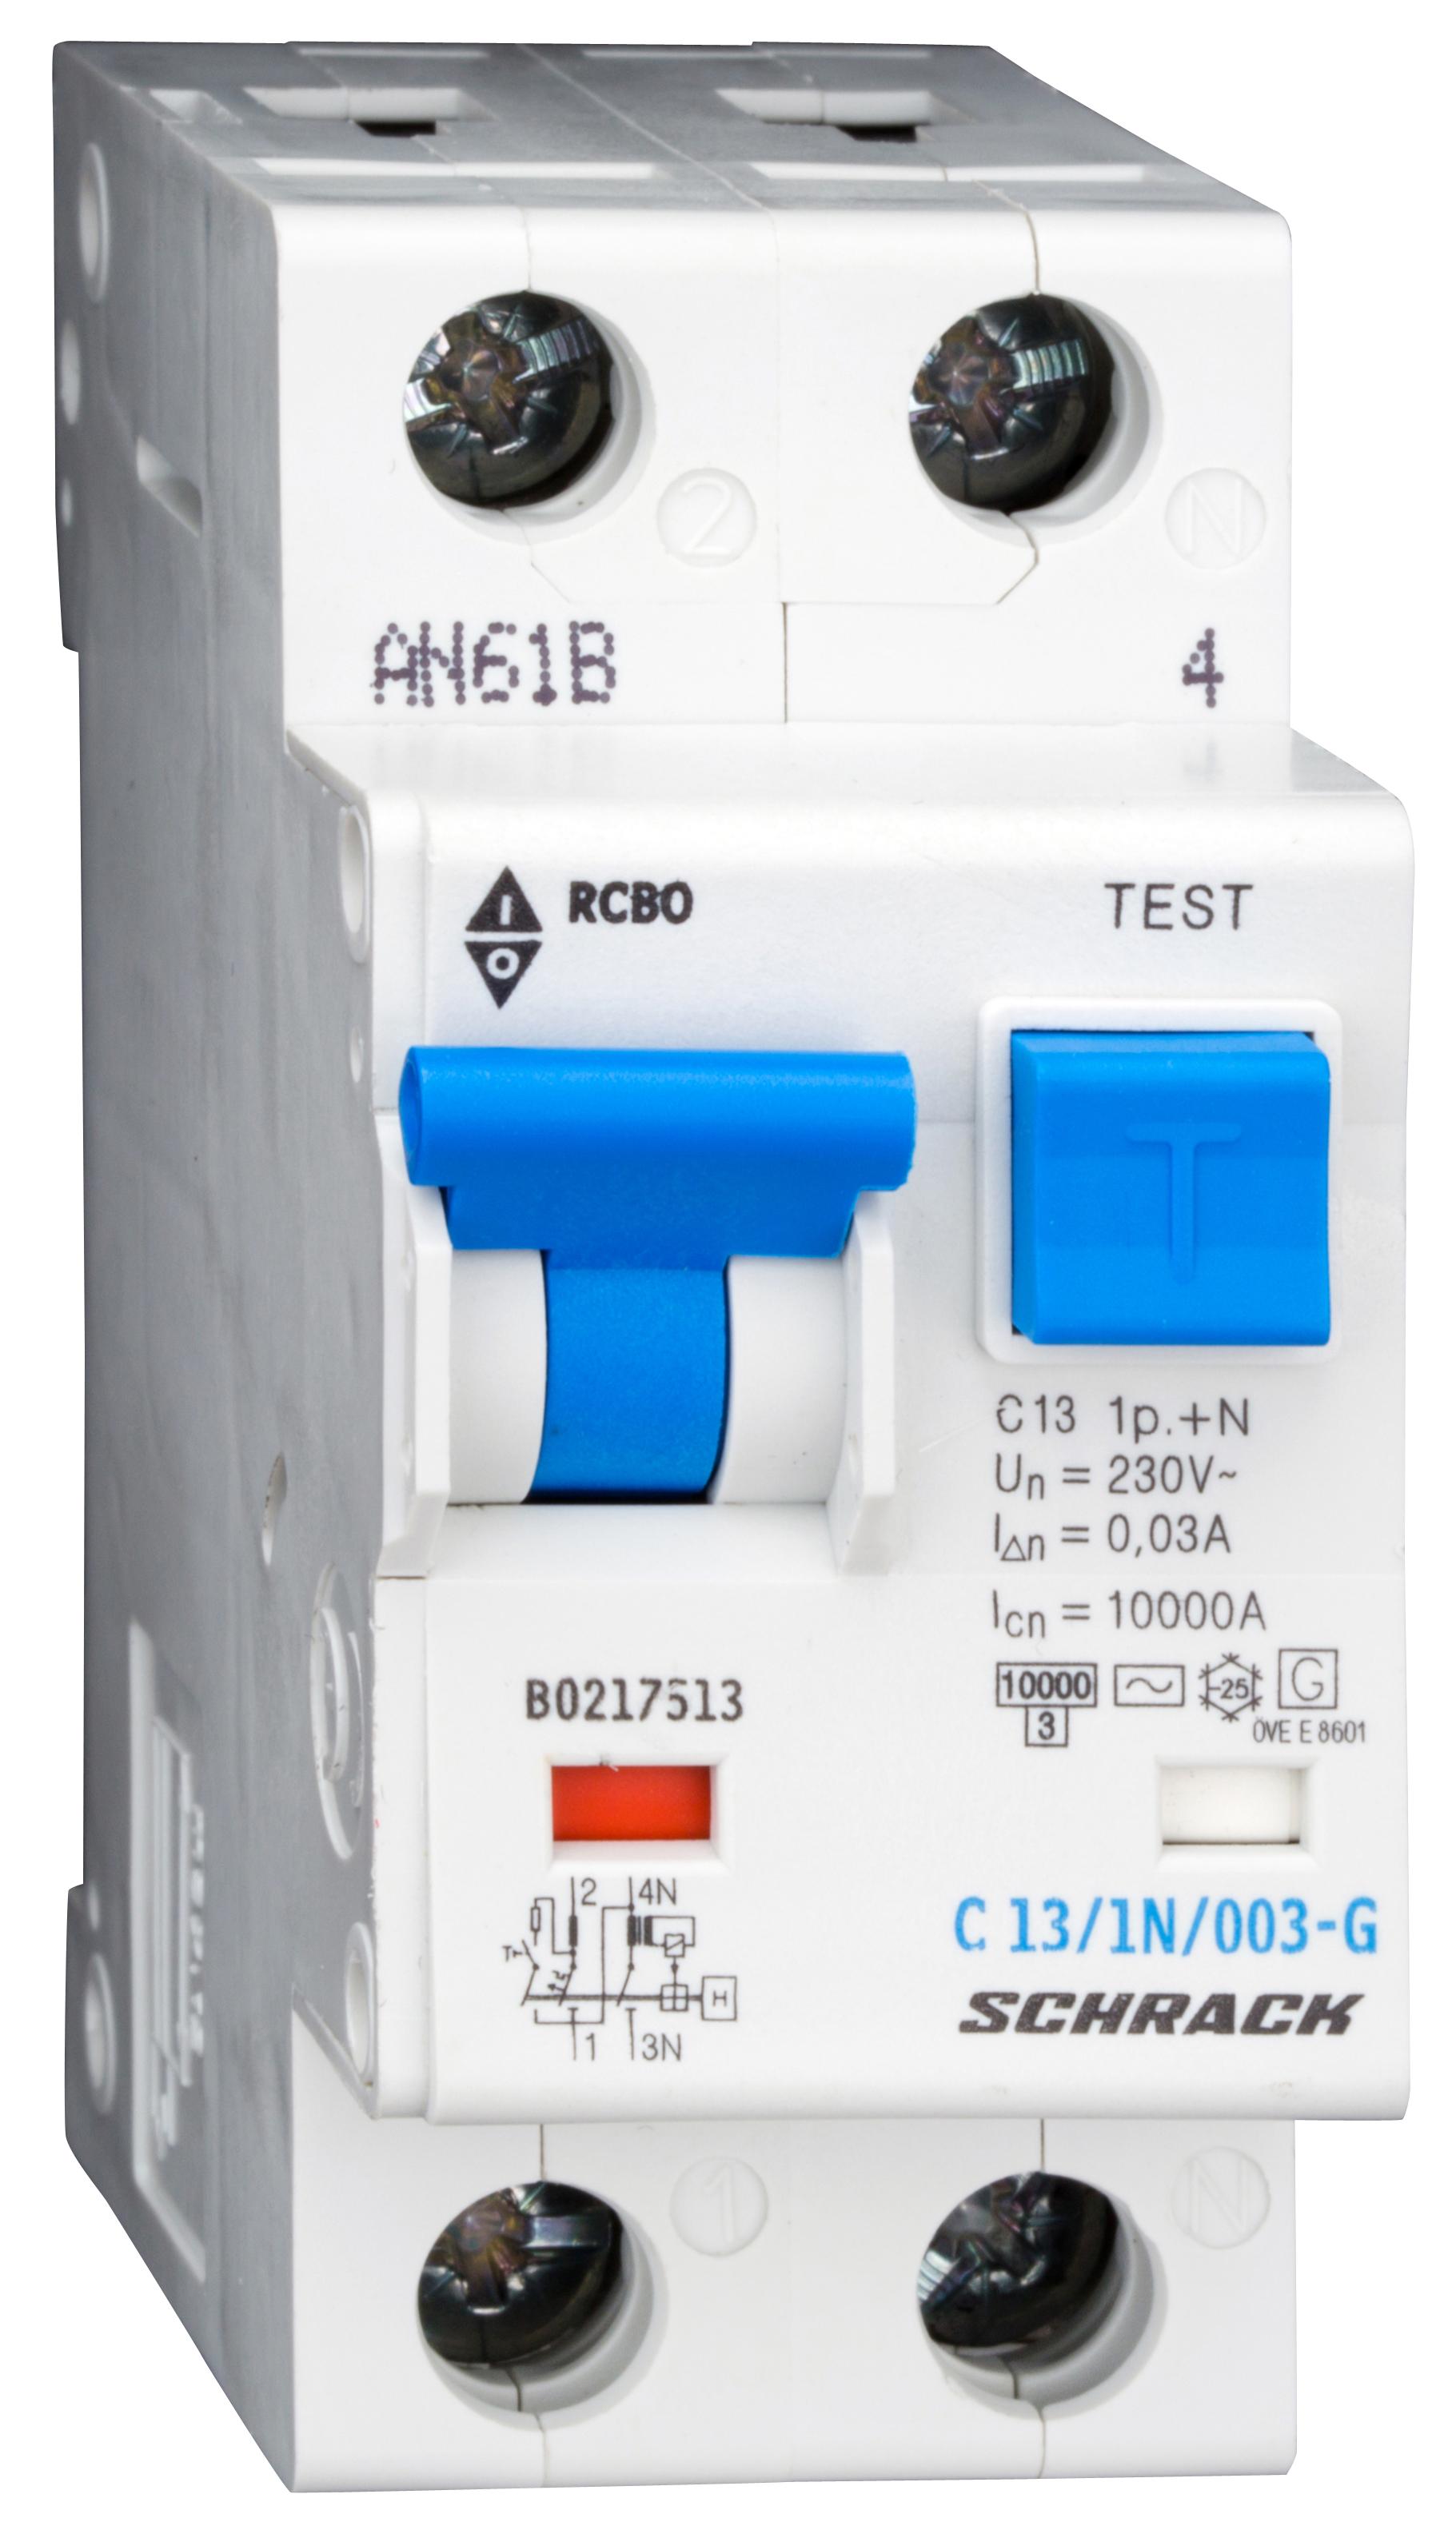 1 Stk LS-FI-Schalter,Kennl. C,13A,30mA,1-polig+N, Bauart G,Typ AC BO217513--